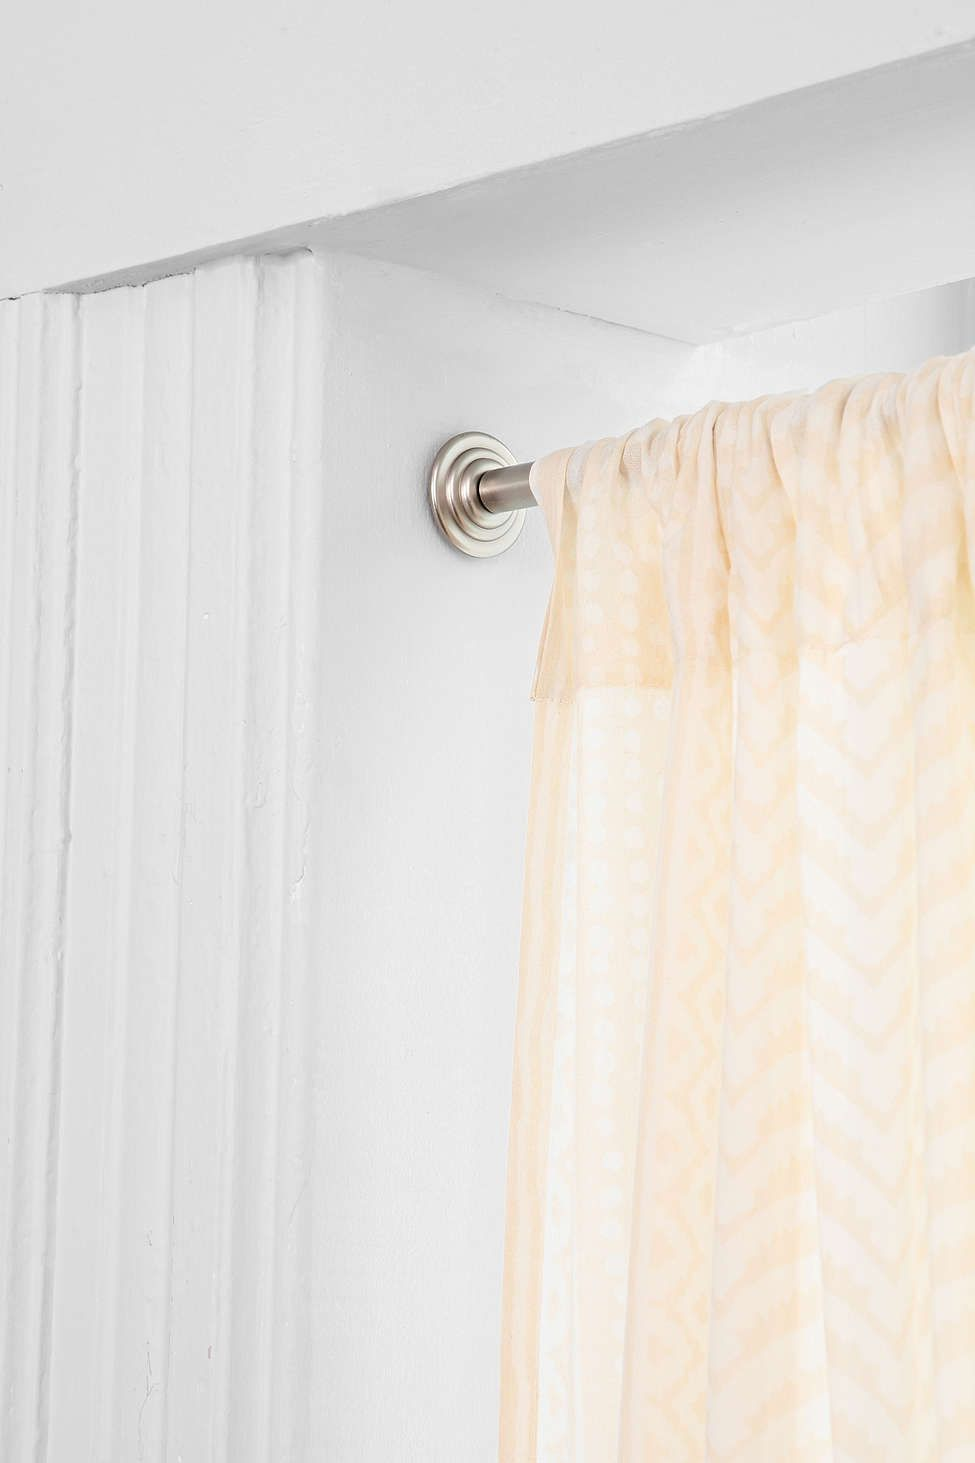 Coretto tension curtain rod urban and catalog